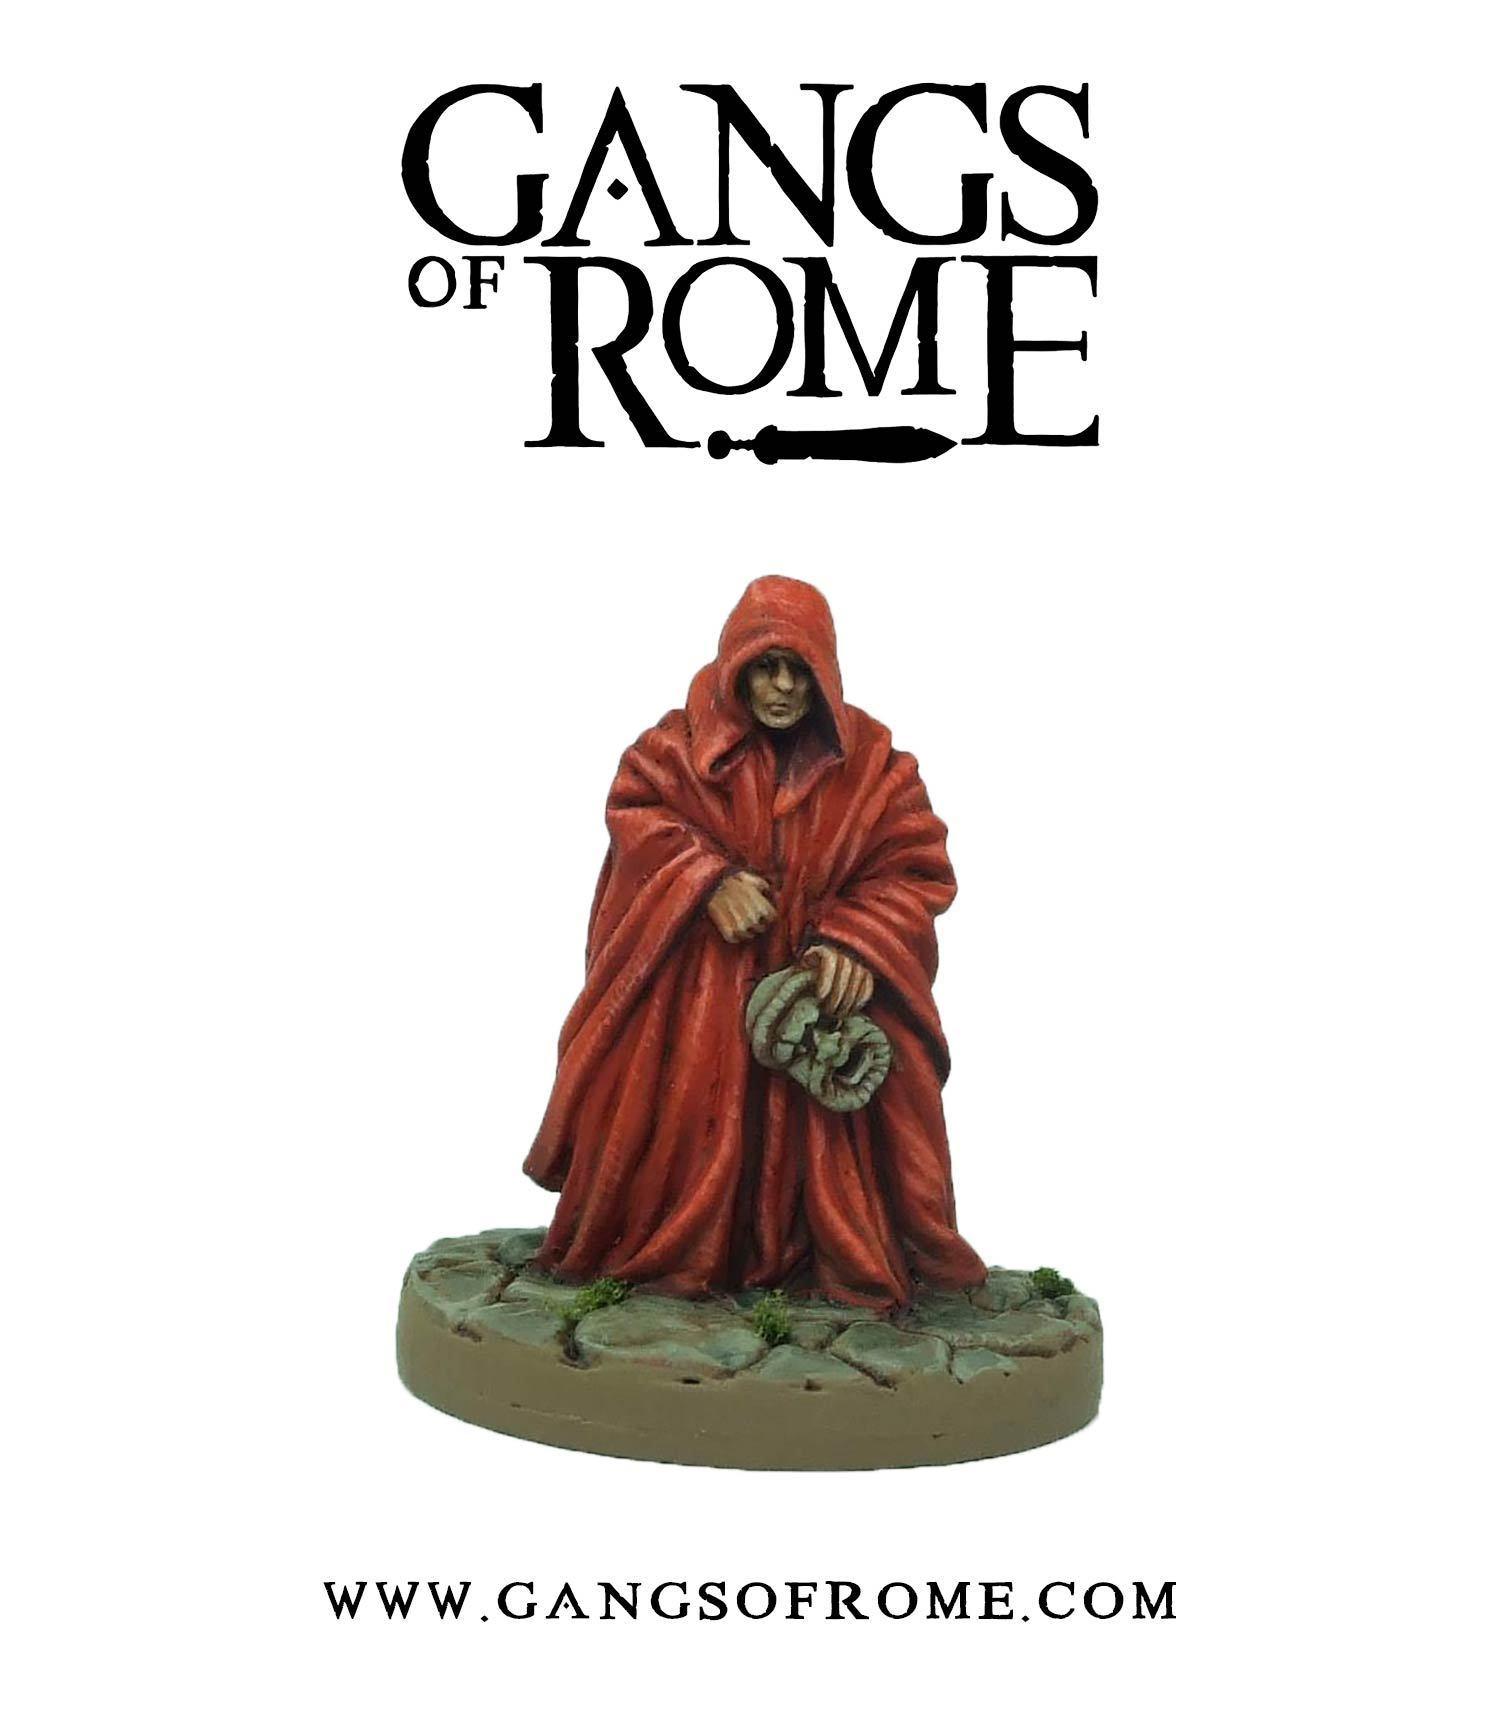 Agente, Gangs of Rome